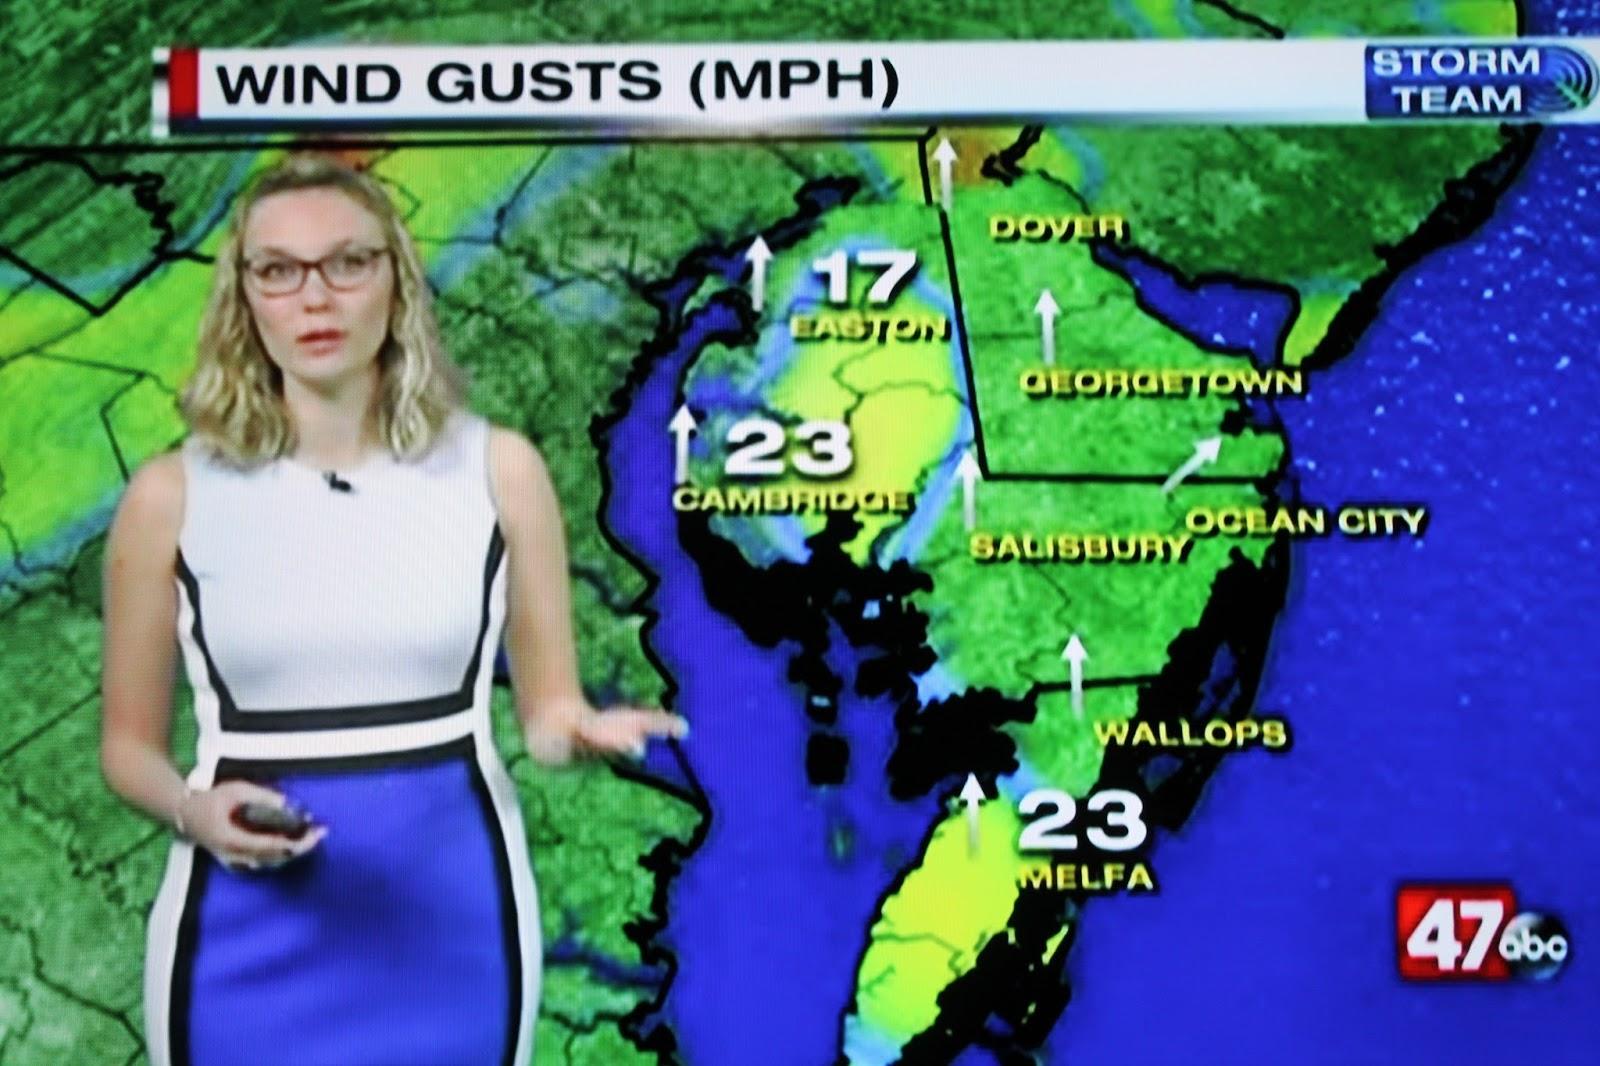 Salisbury News: TEMPICHUR: ALL Local Meteorologists